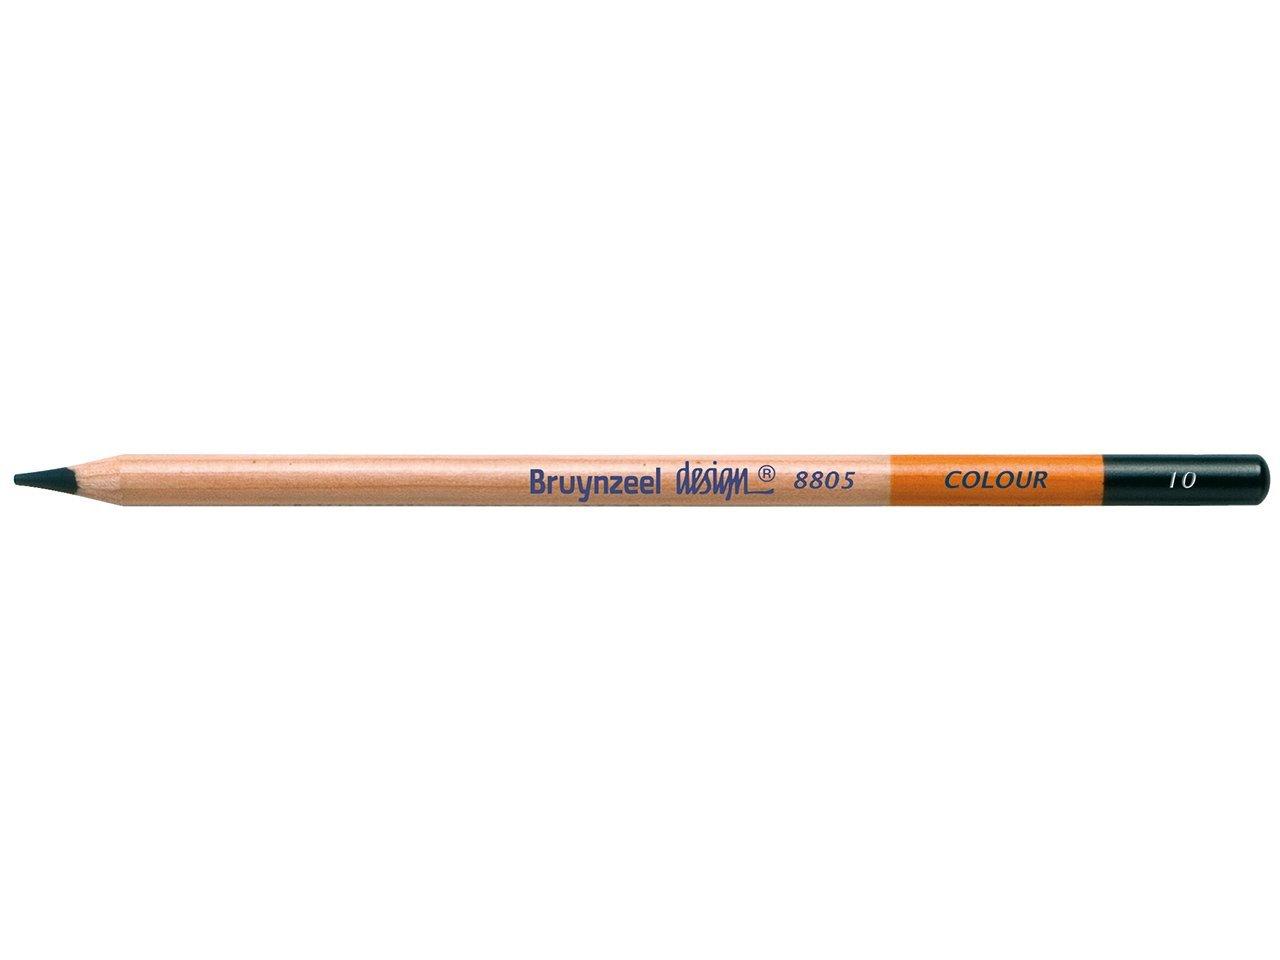 Bruynzeel pencil - 10 Black